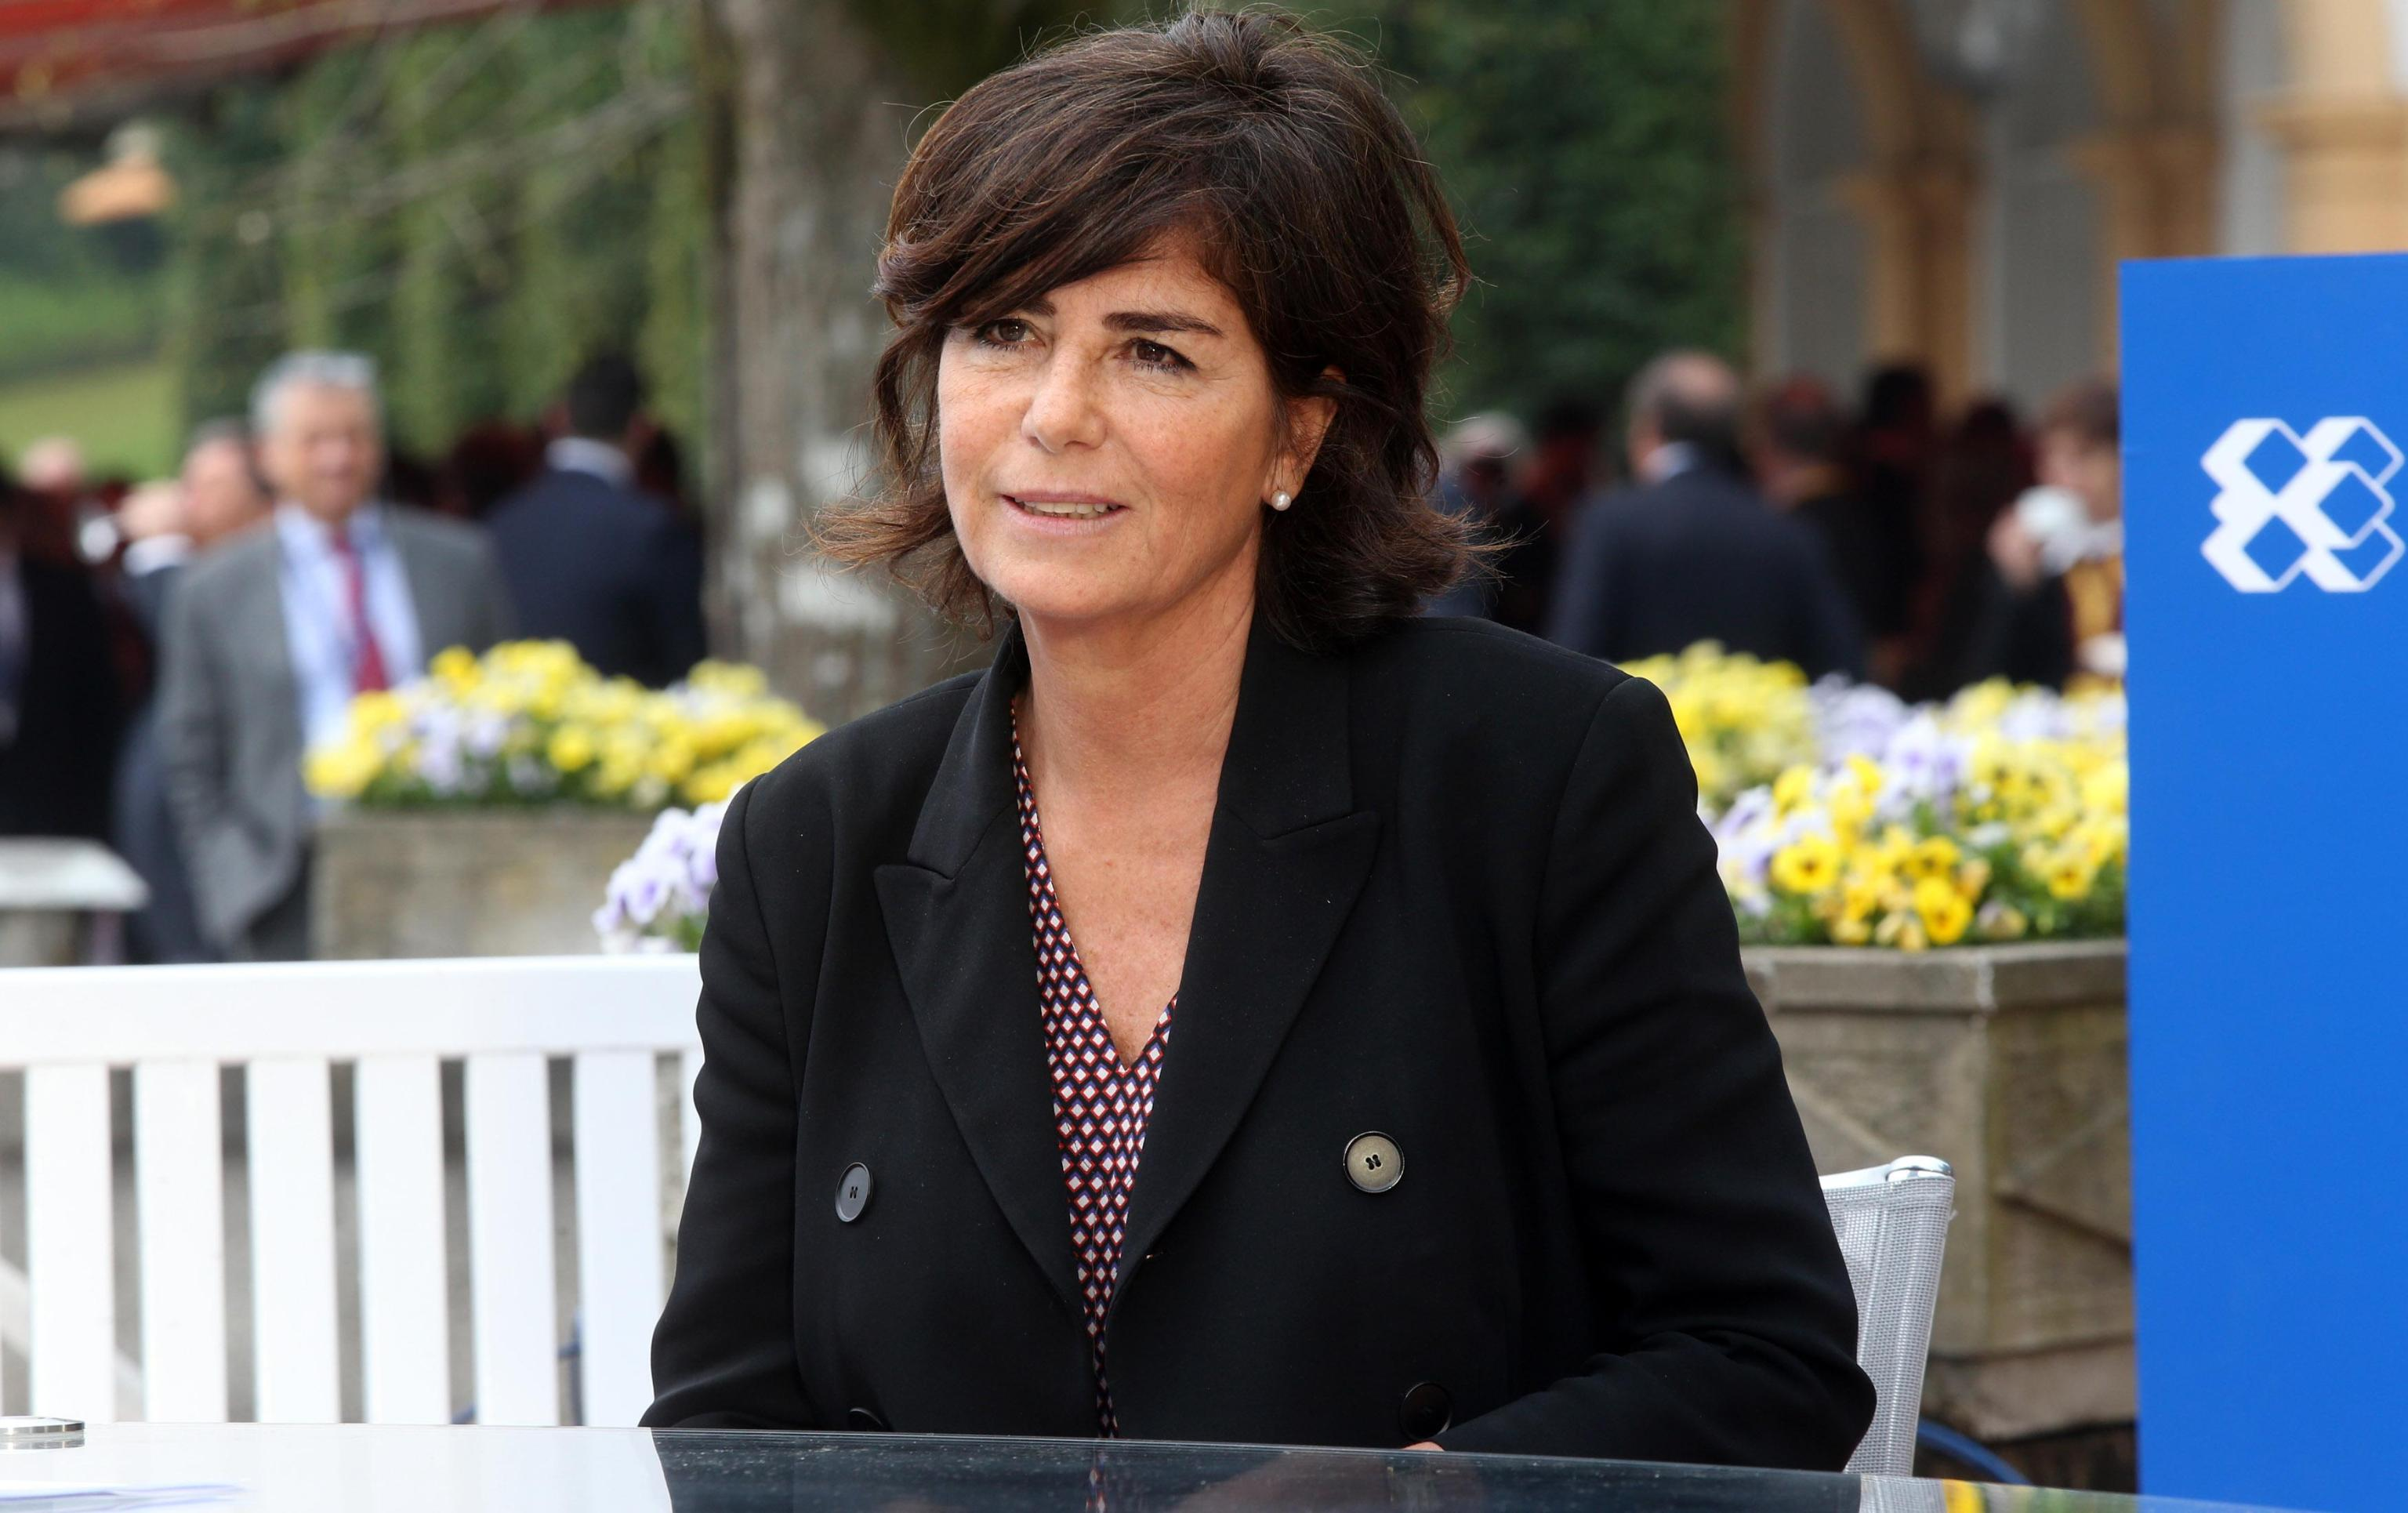 Lucrezia-Reichlin